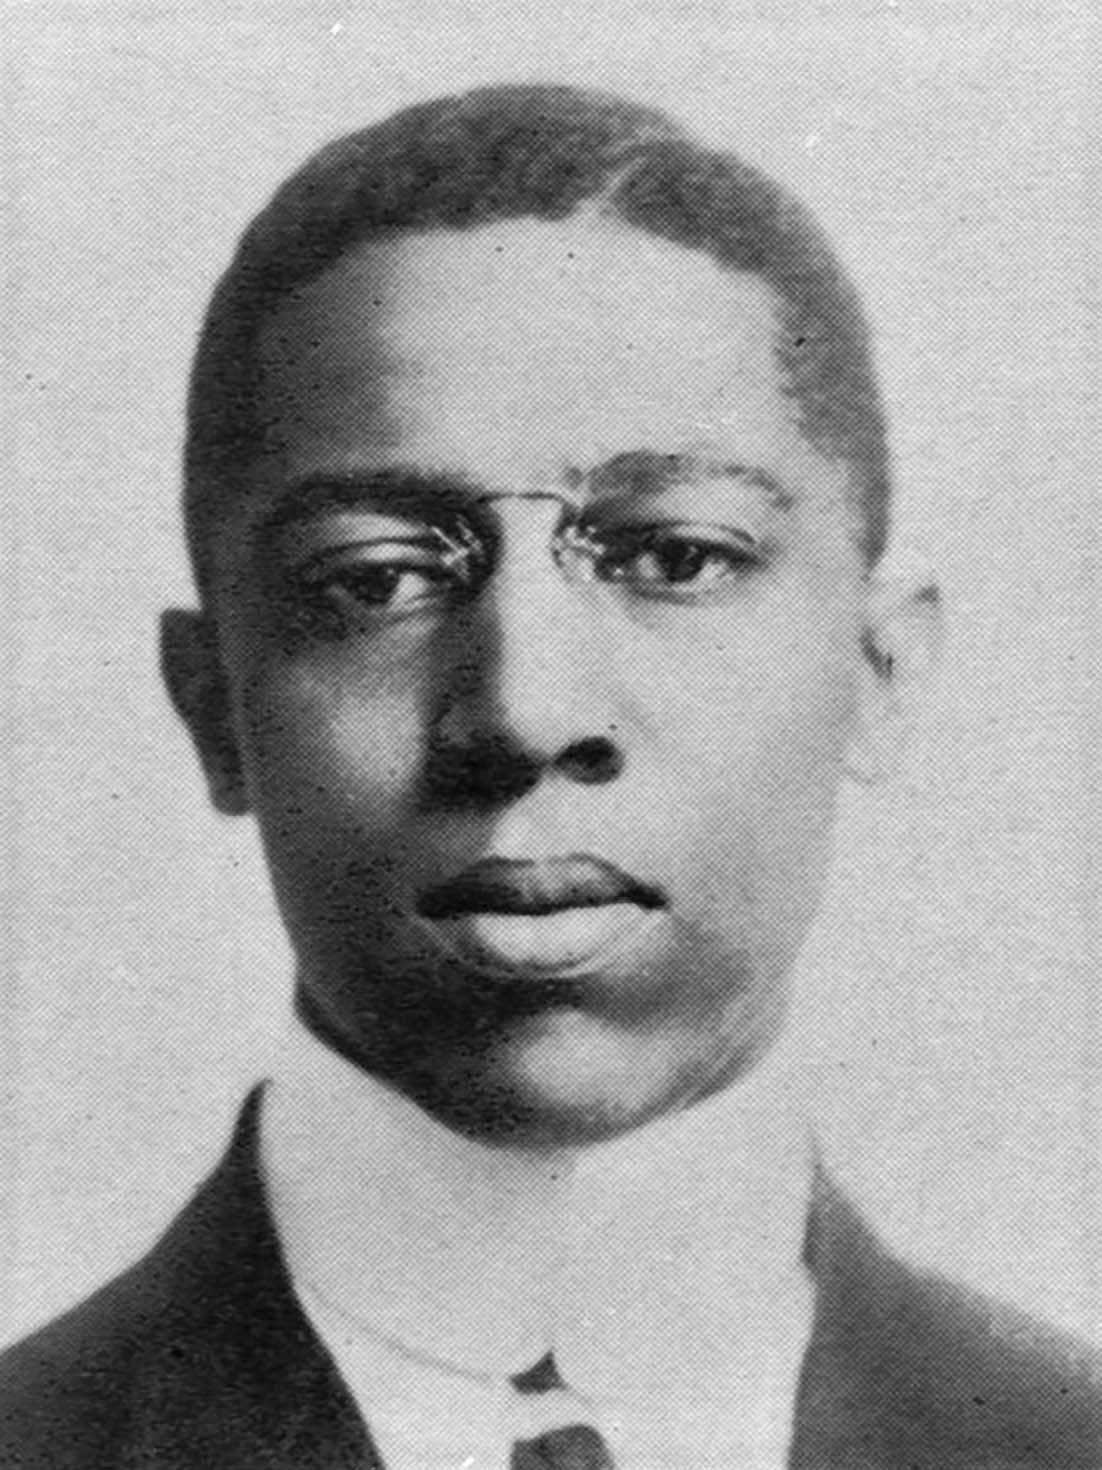 Roscoe Conkling Giles, Cornell Class Book, 1911